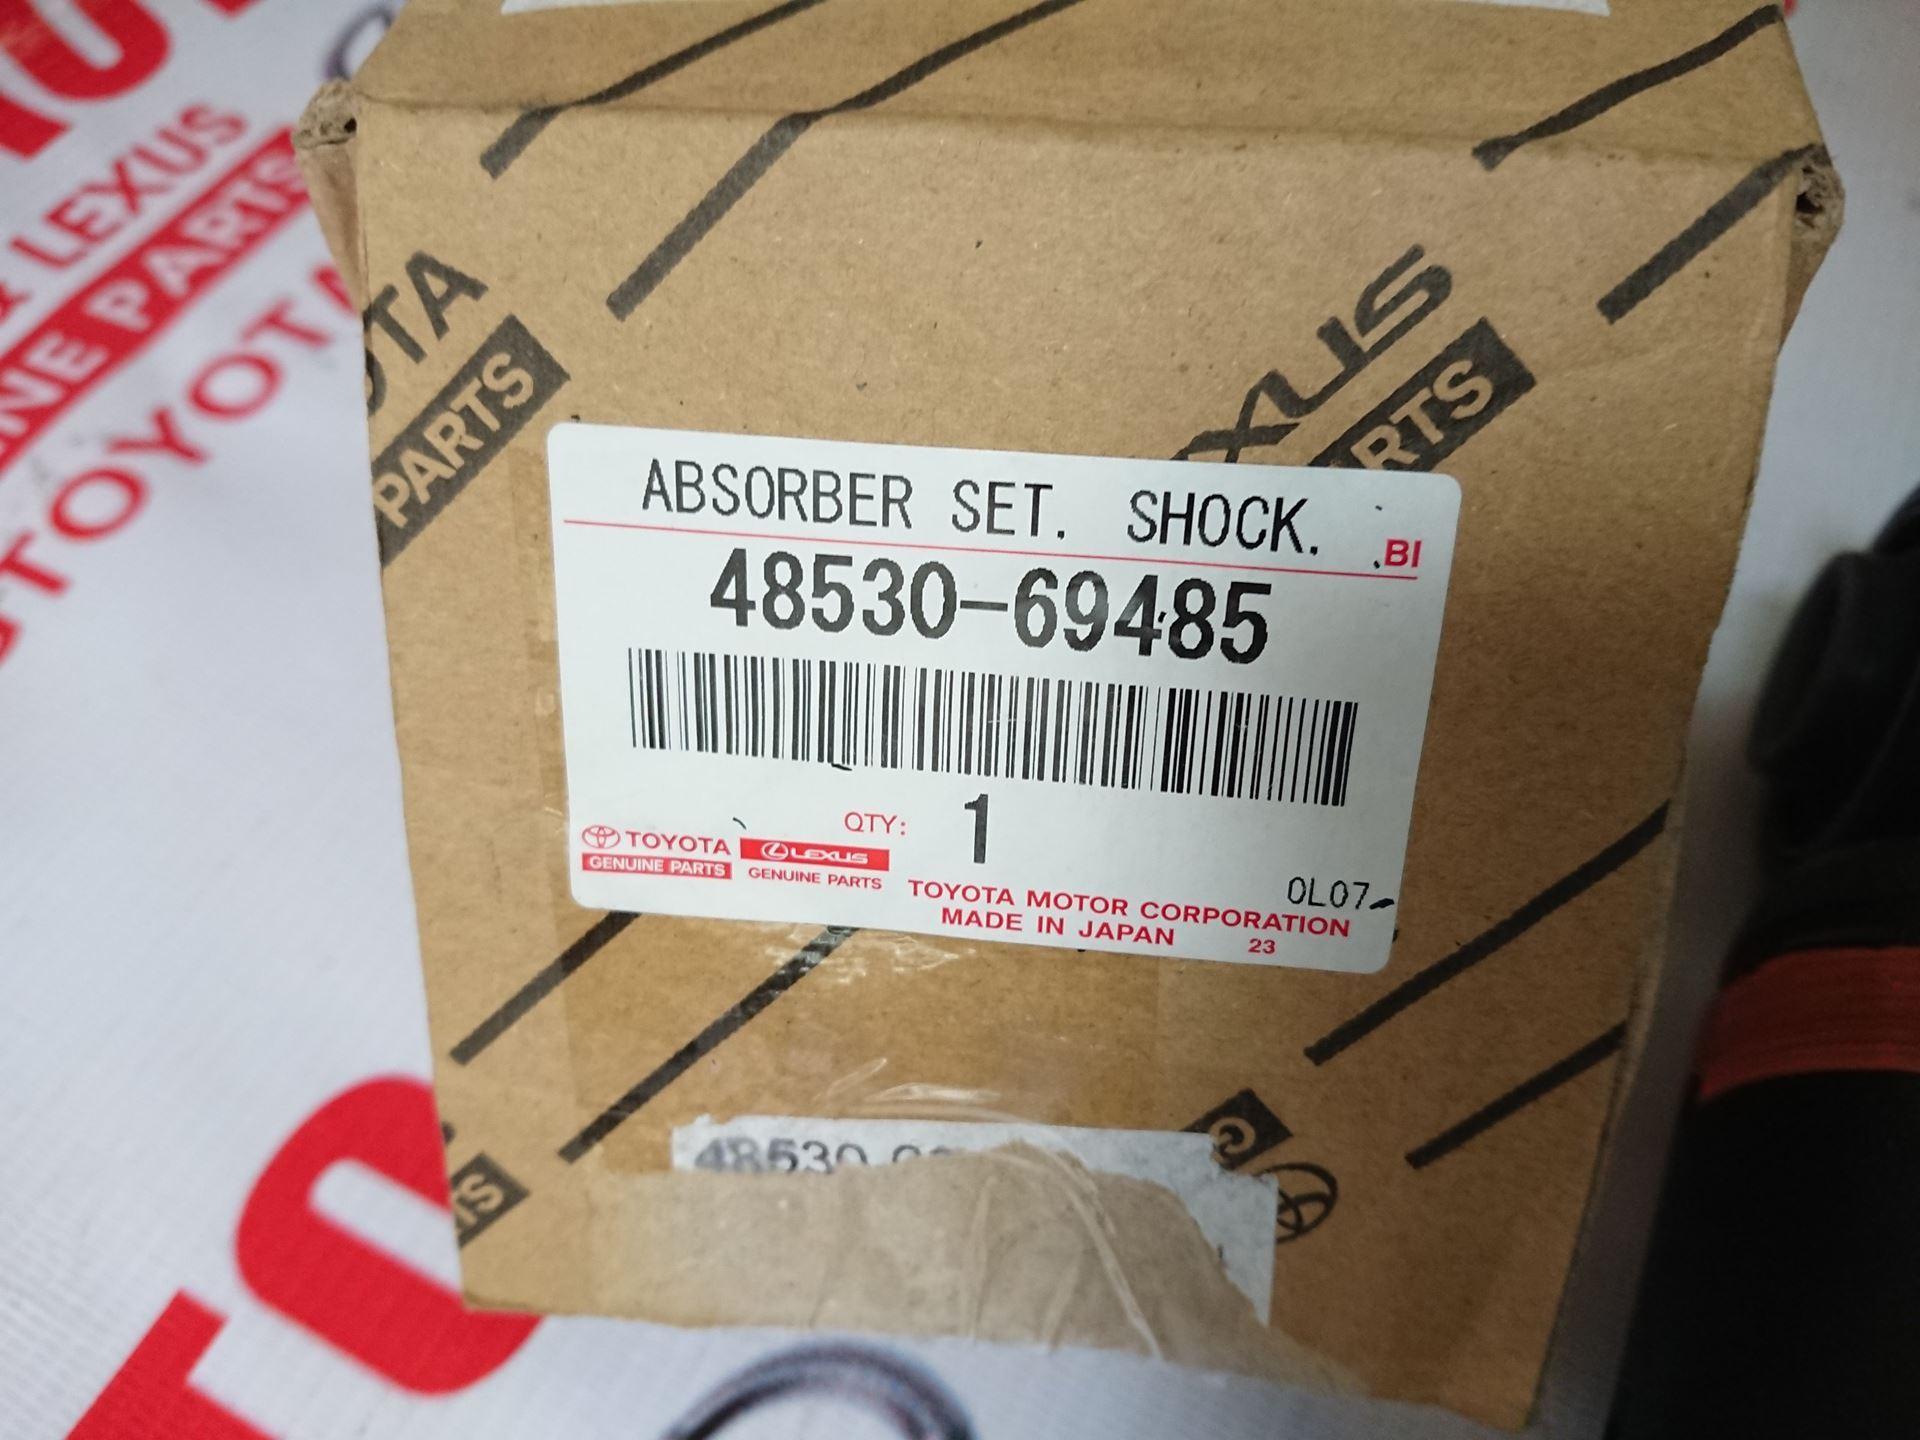 Picture of 48530-69485 Giảm xóc sau, giảm sóc sau Lexus GX470, Land Cruiser Prado